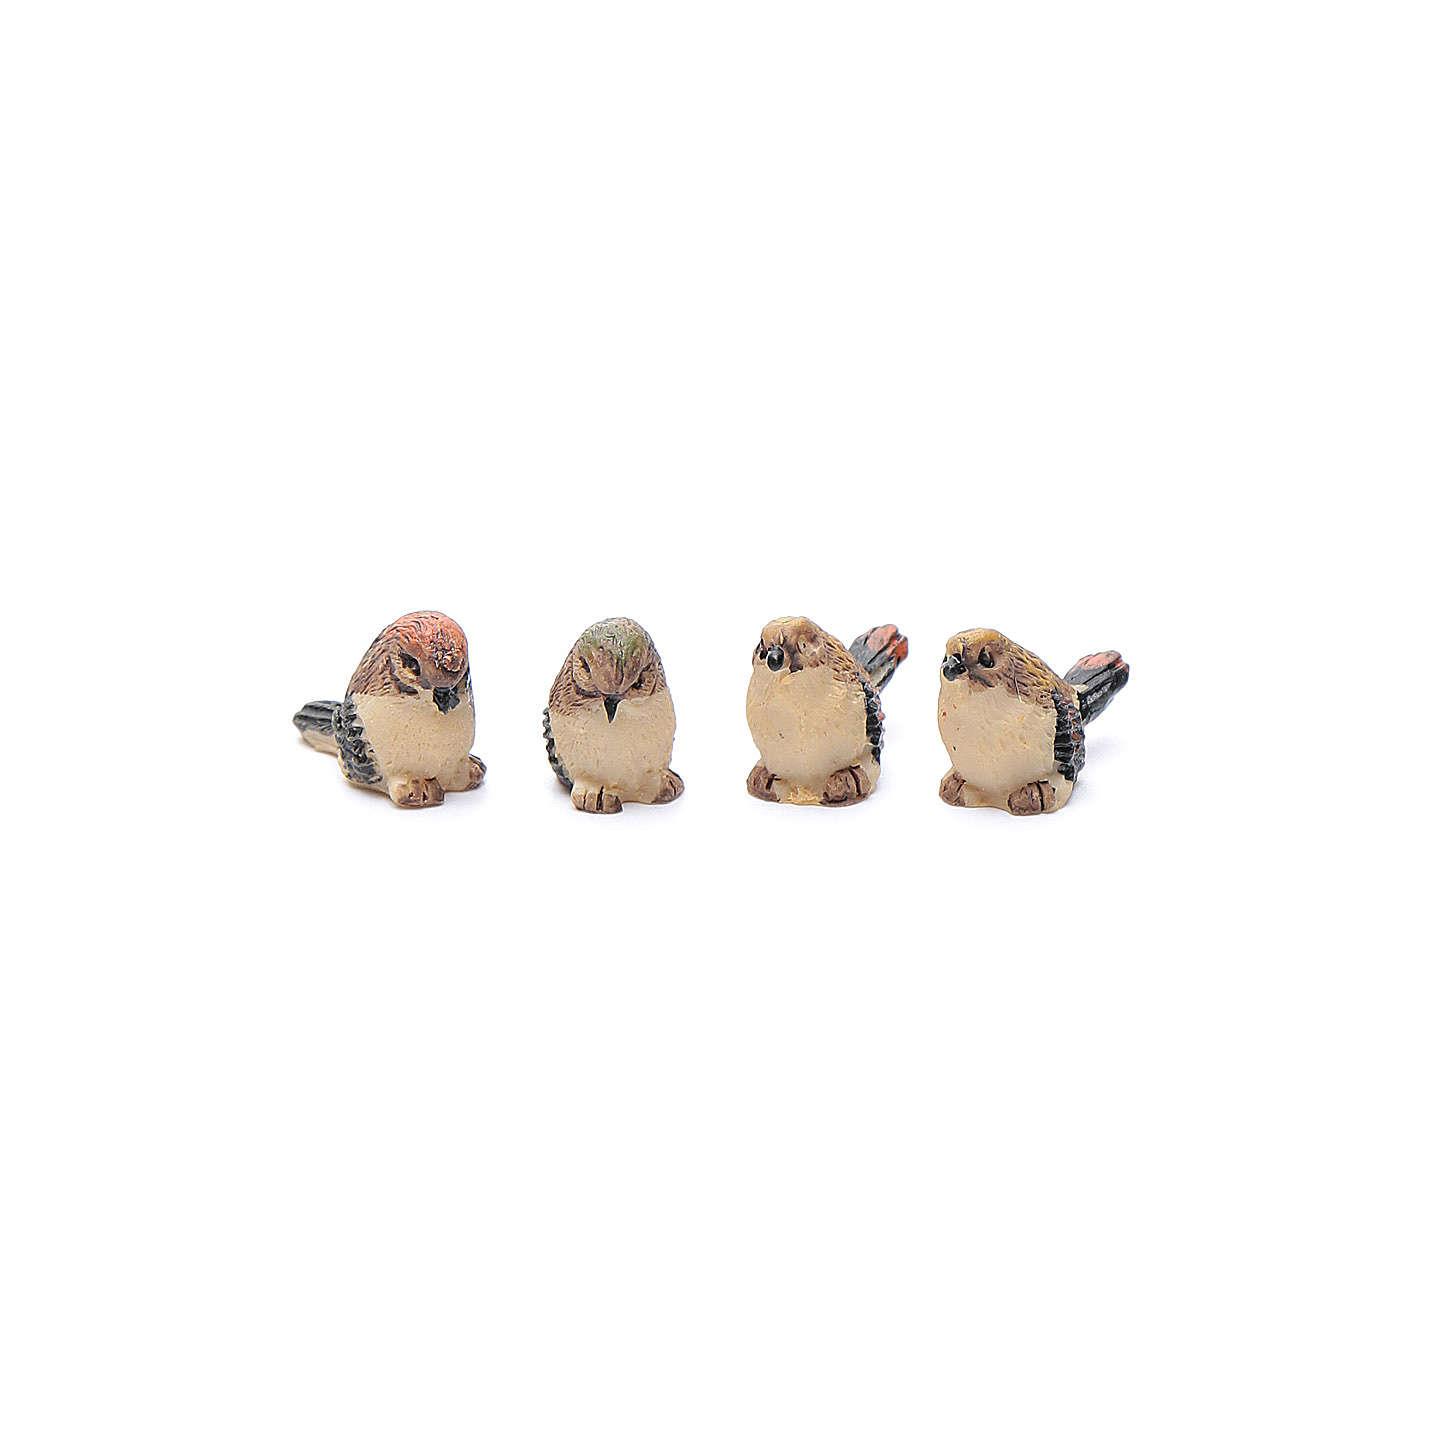 Nativity figurines, birds in resin measuring 2 cm, 4 pieces 3